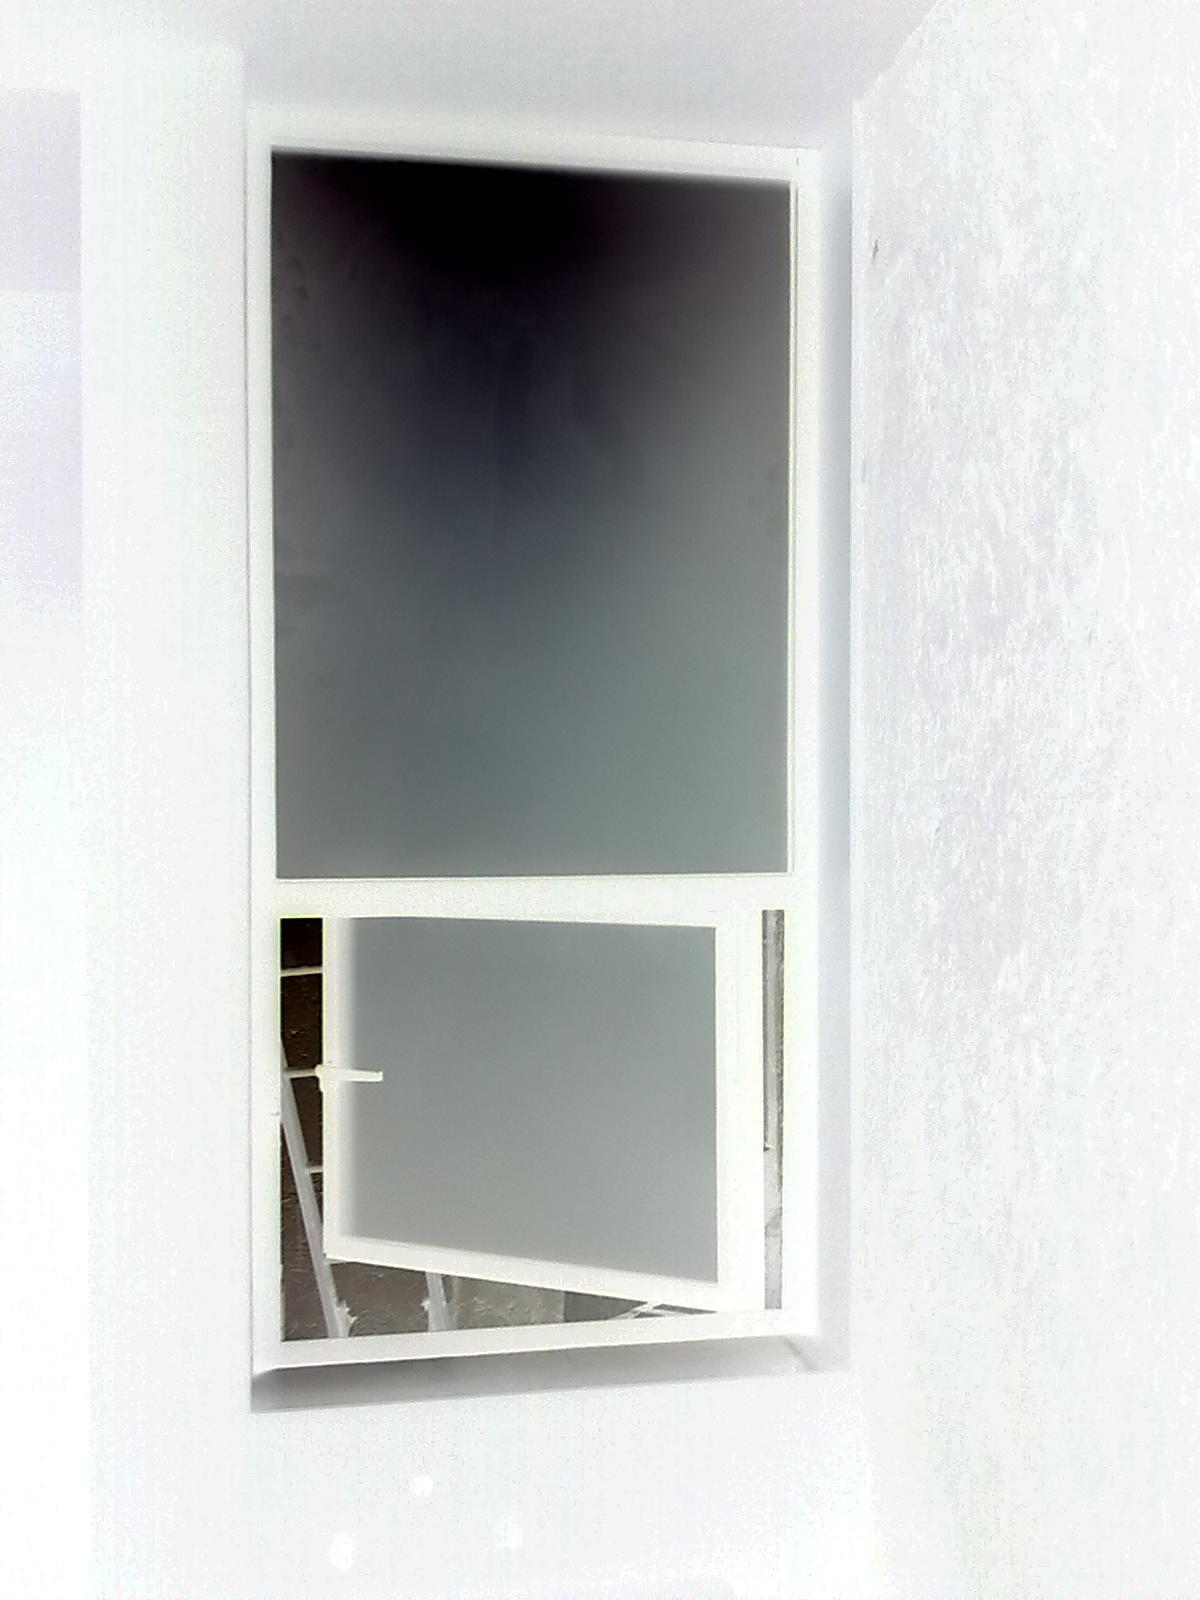 Vidrier a palo solo ventanas for Barandales de aluminio blanco